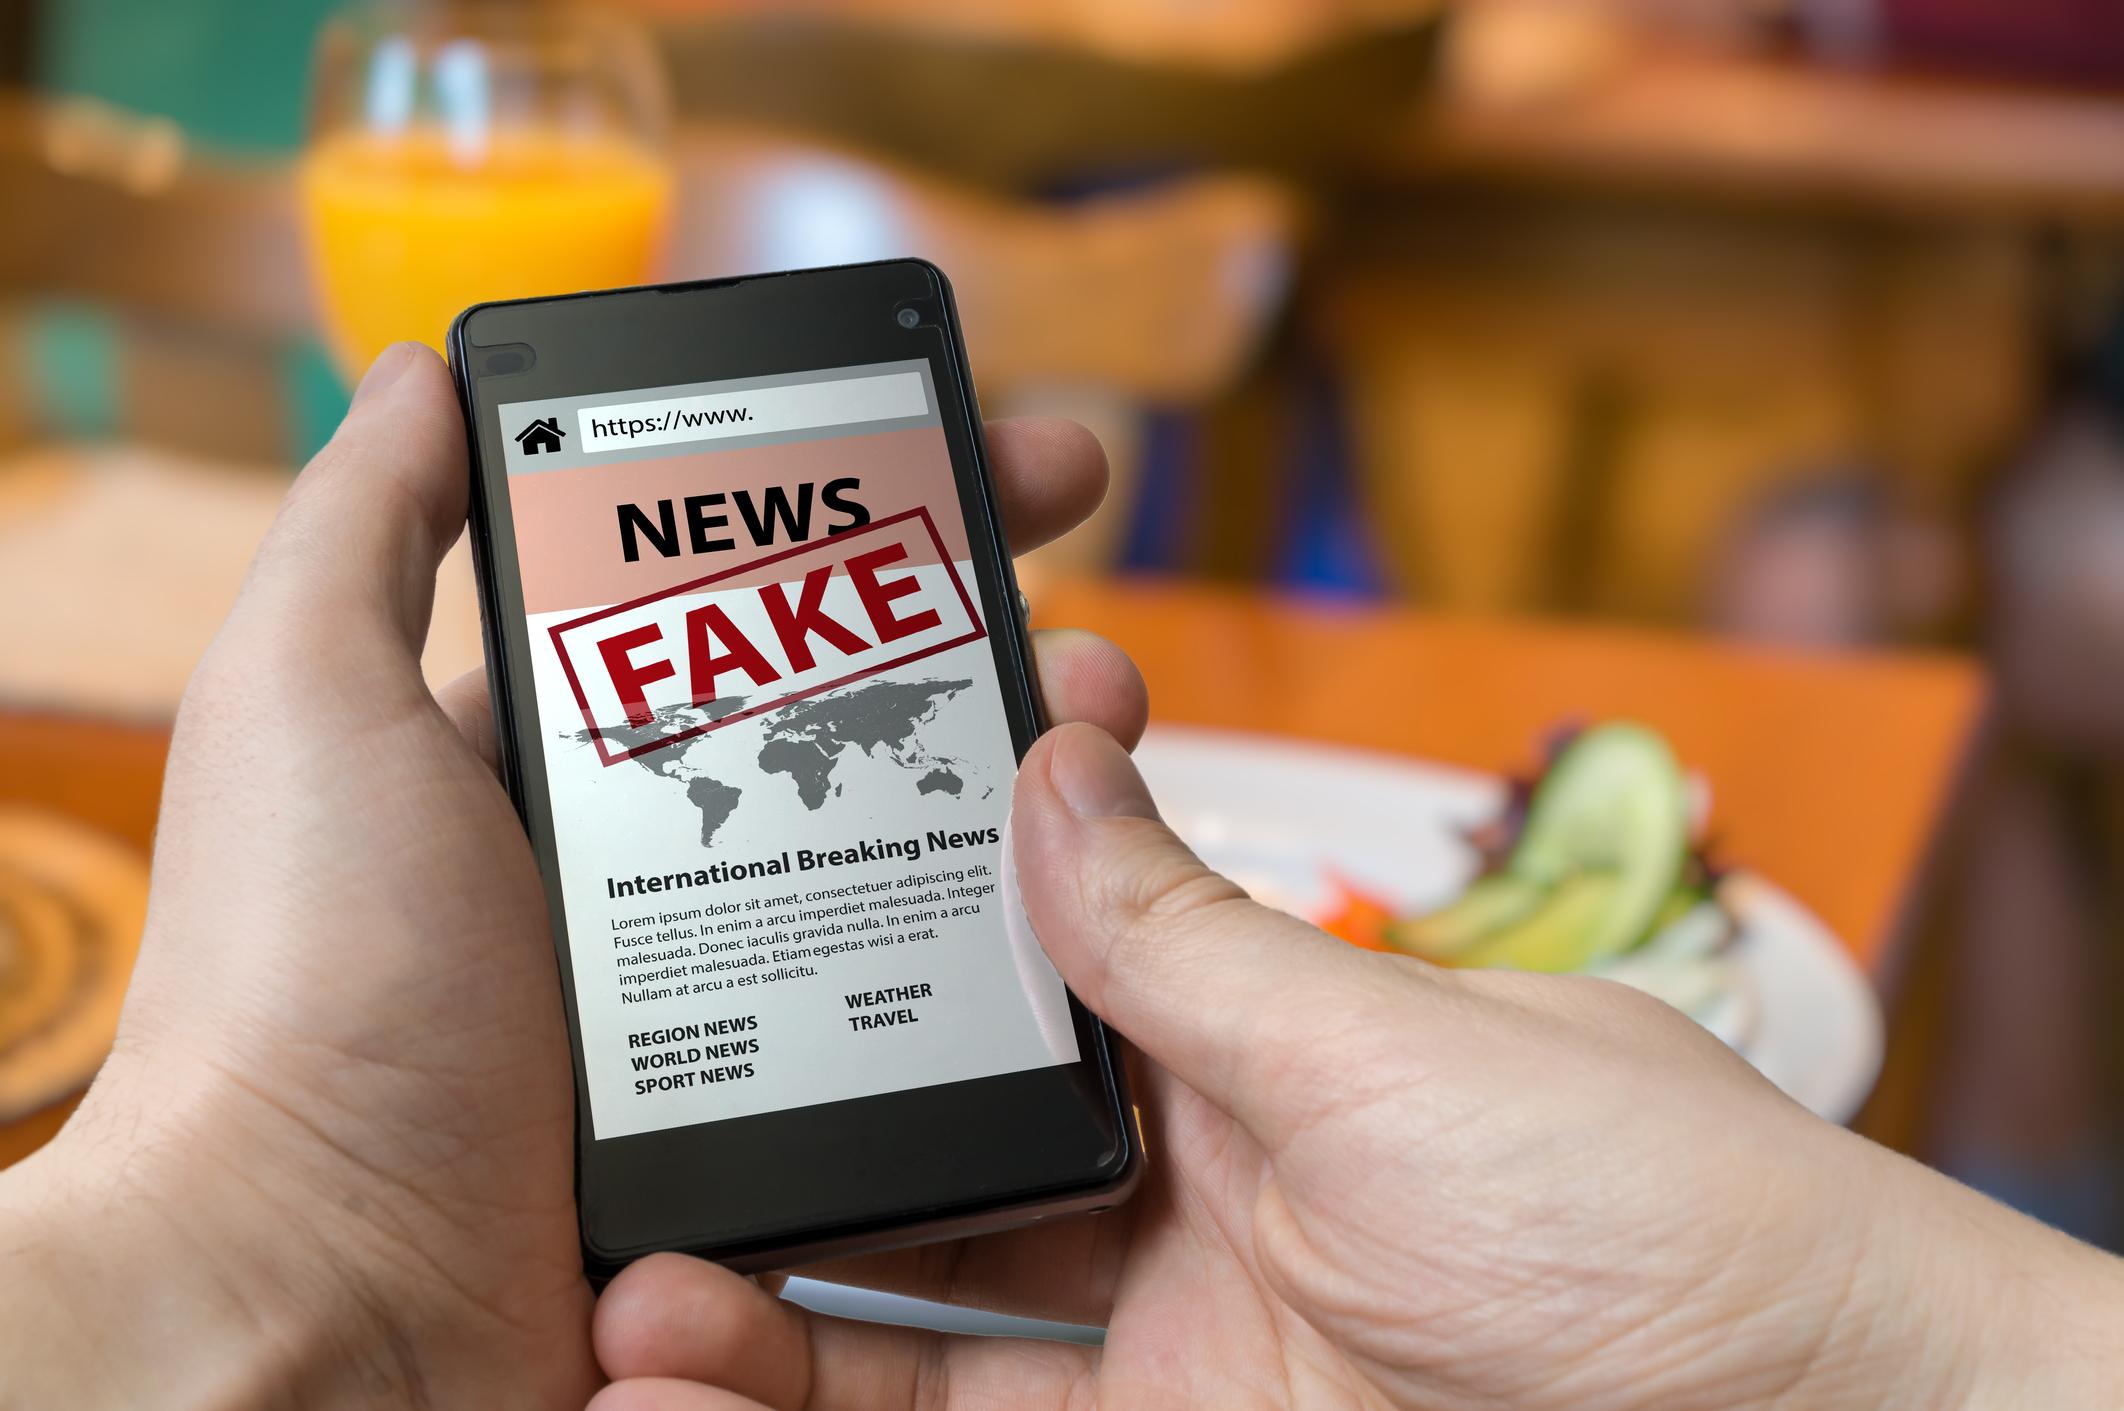 Seis 'fake news' que han calentado este agosto y tal vez te has perdido (o creído)